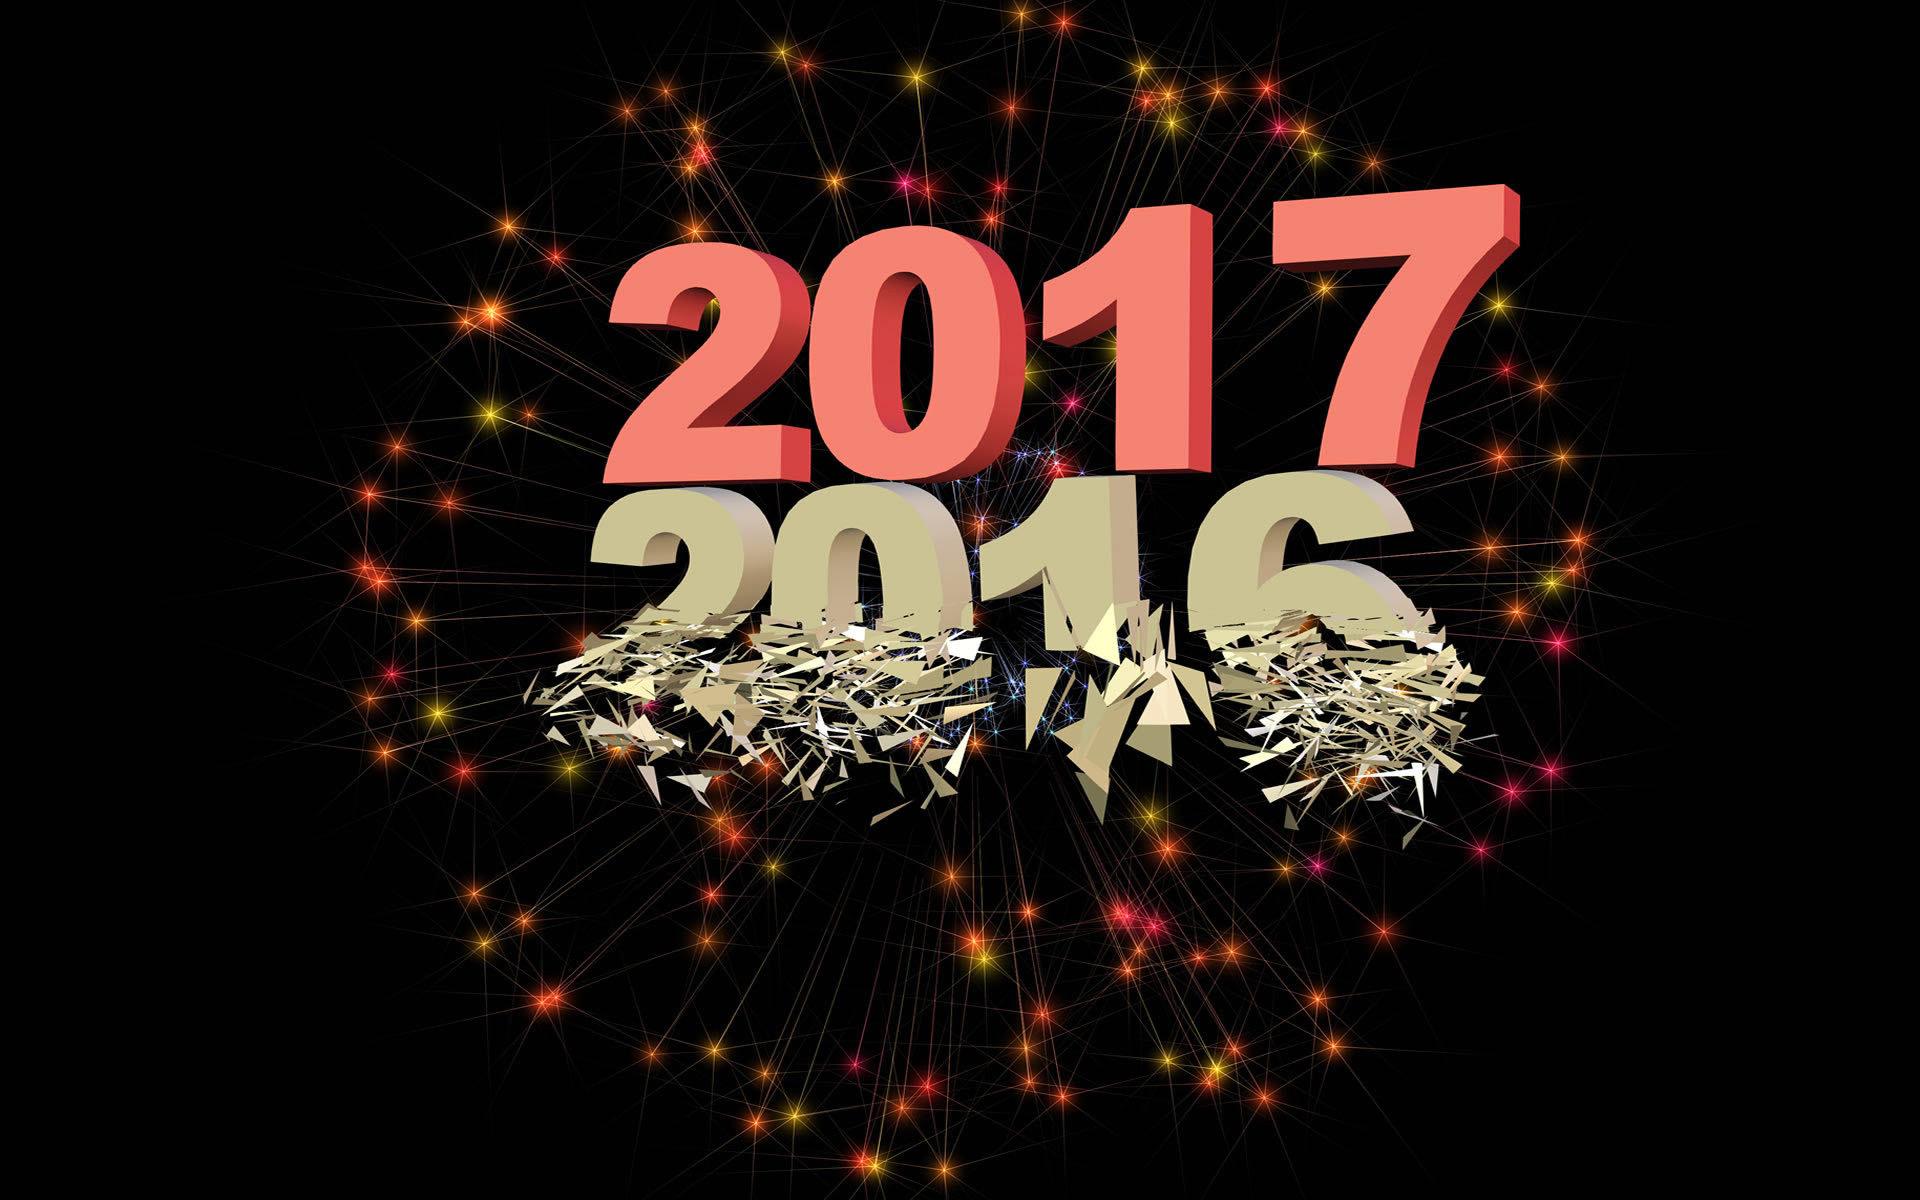 Bonne Année 2017 - MaximumWallHD